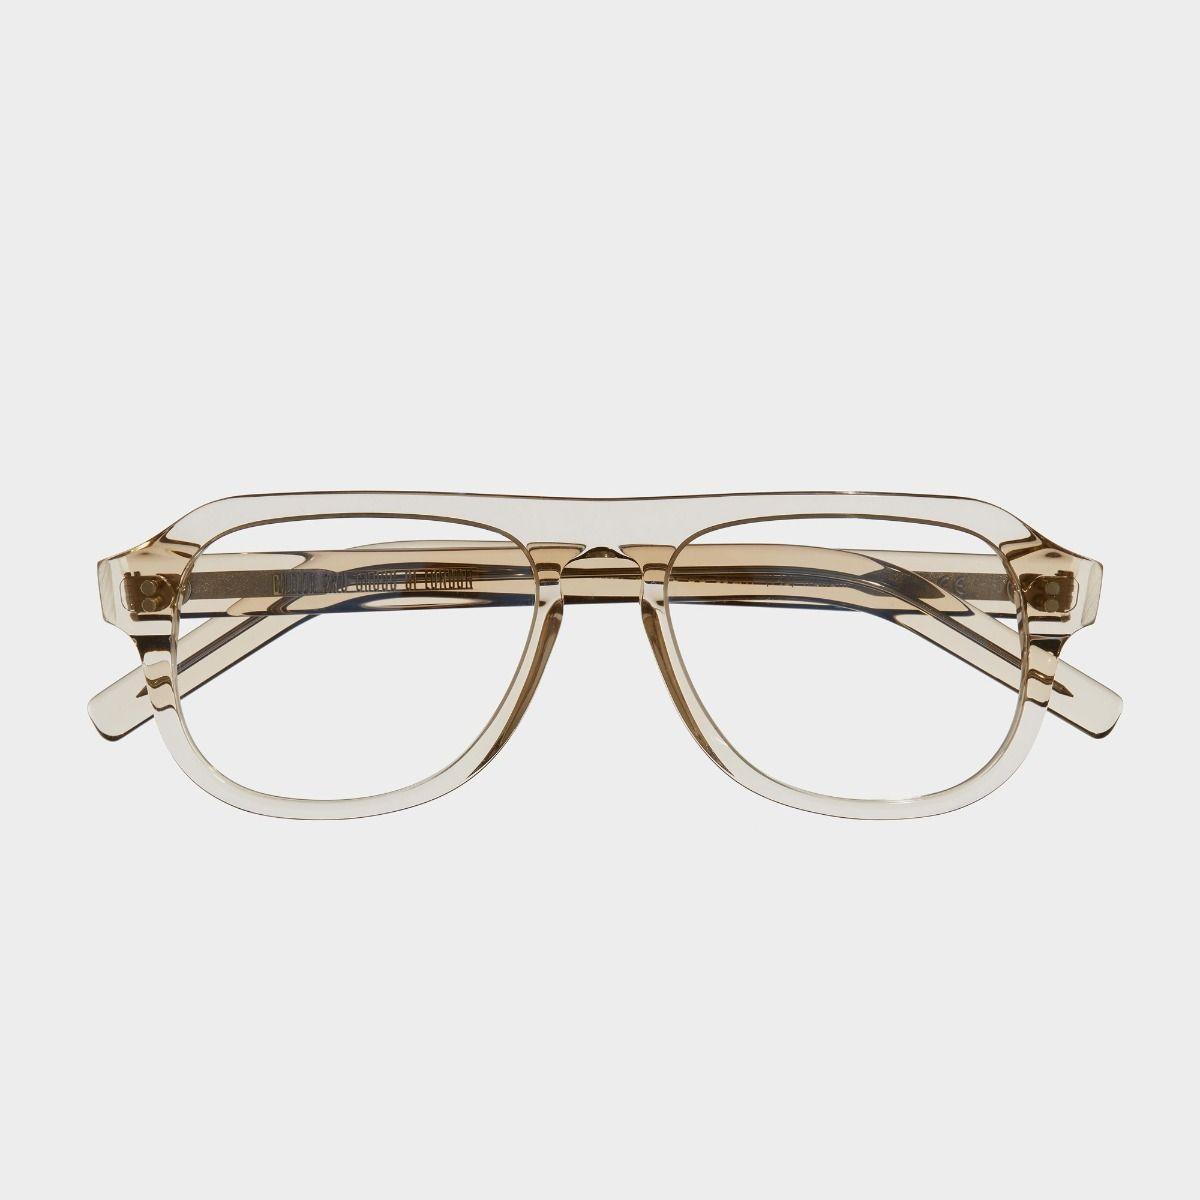 0822V2 Optical Aviator Glasses-Granny Chic